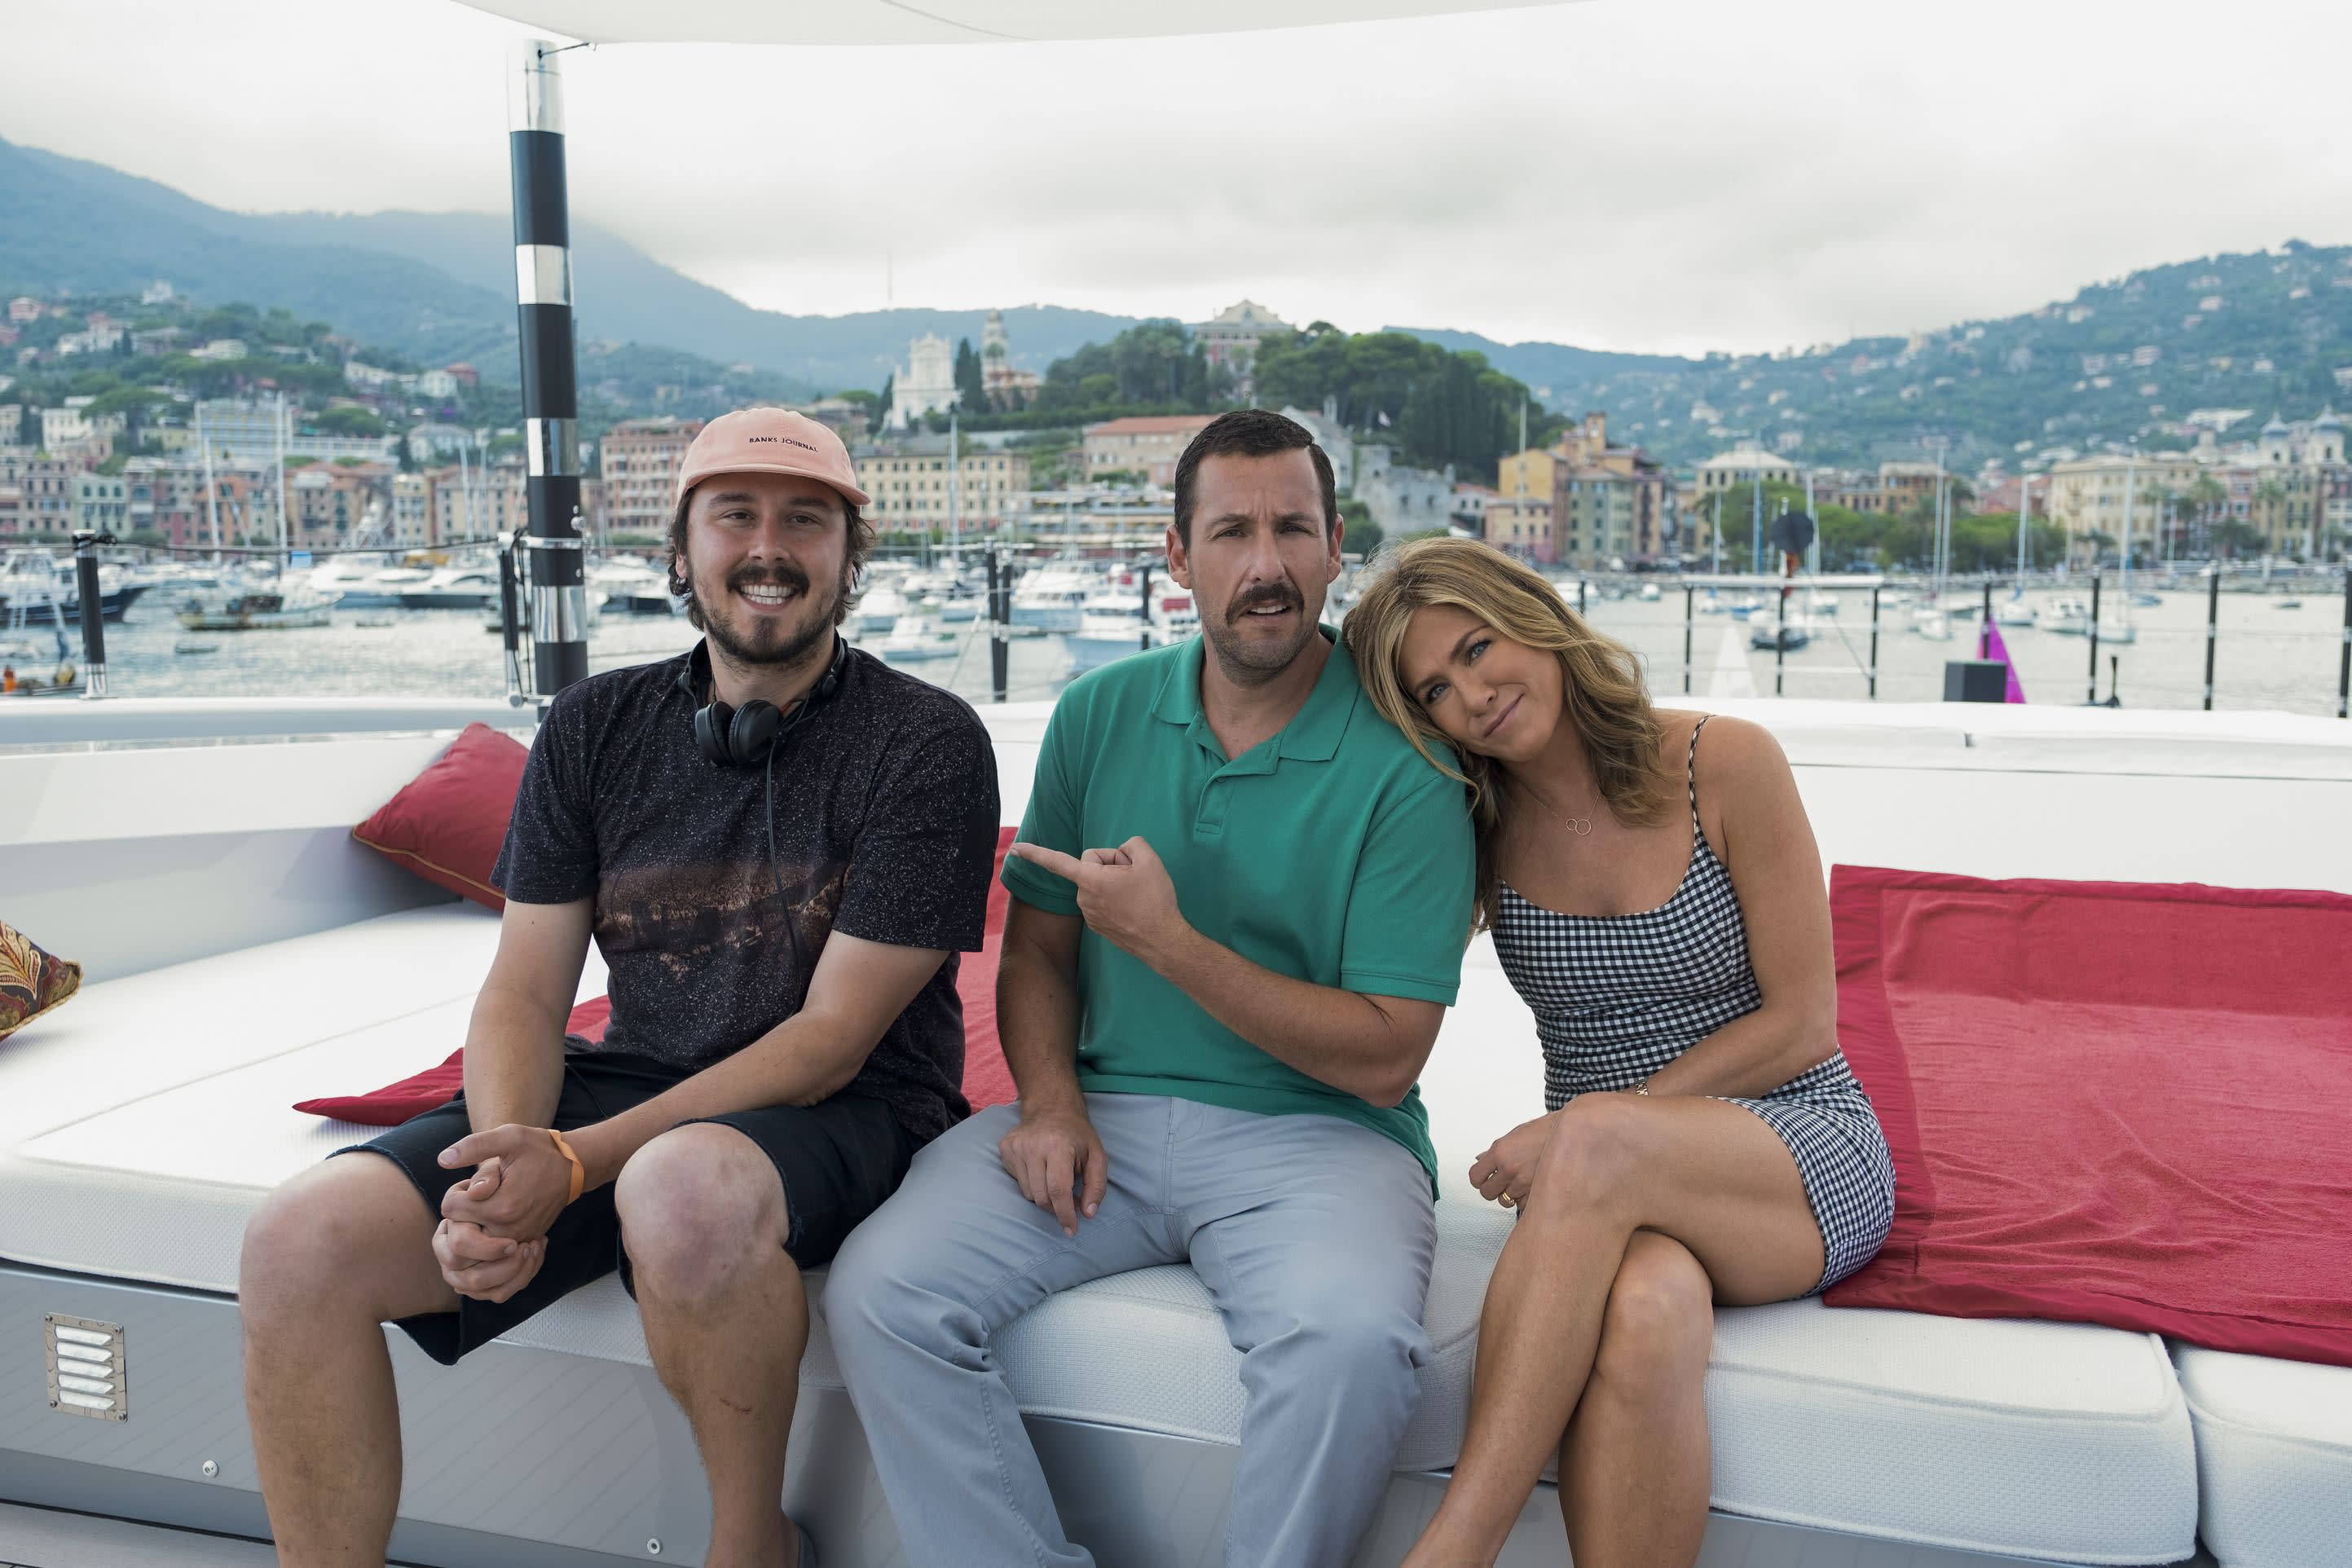 Murder Mystery,' starring Jennifer Aniston and Adam Sandler